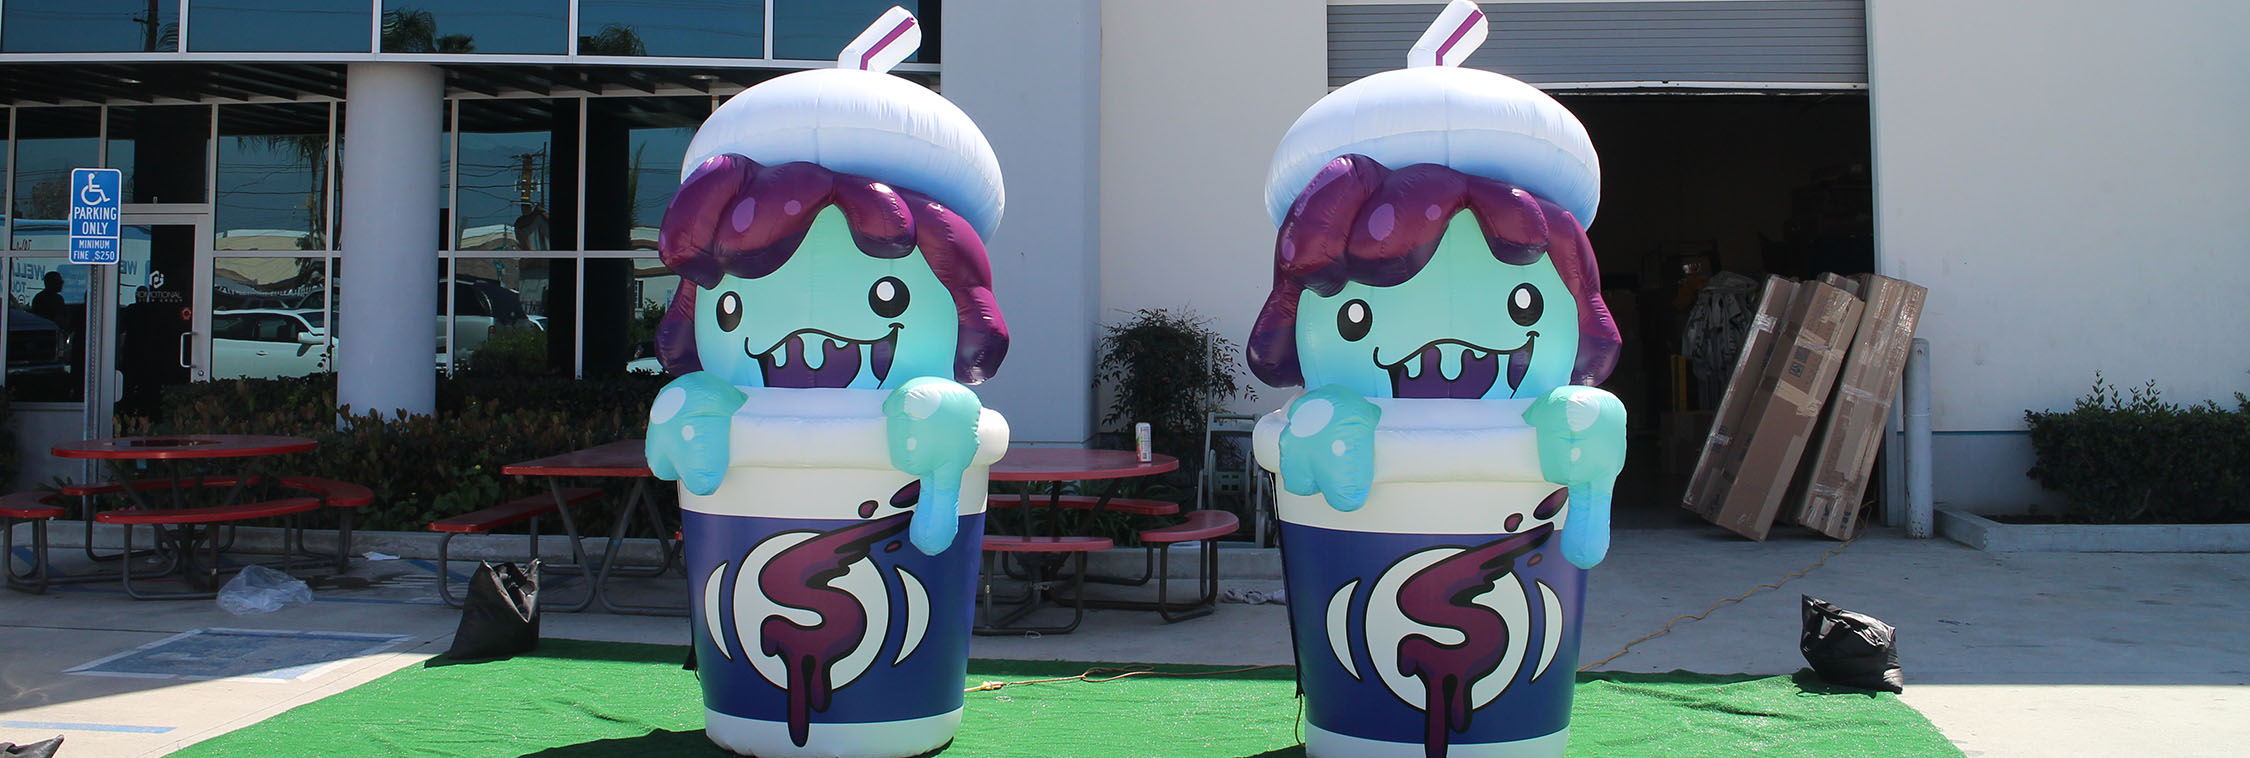 slushii-mascot-prop-inflatables